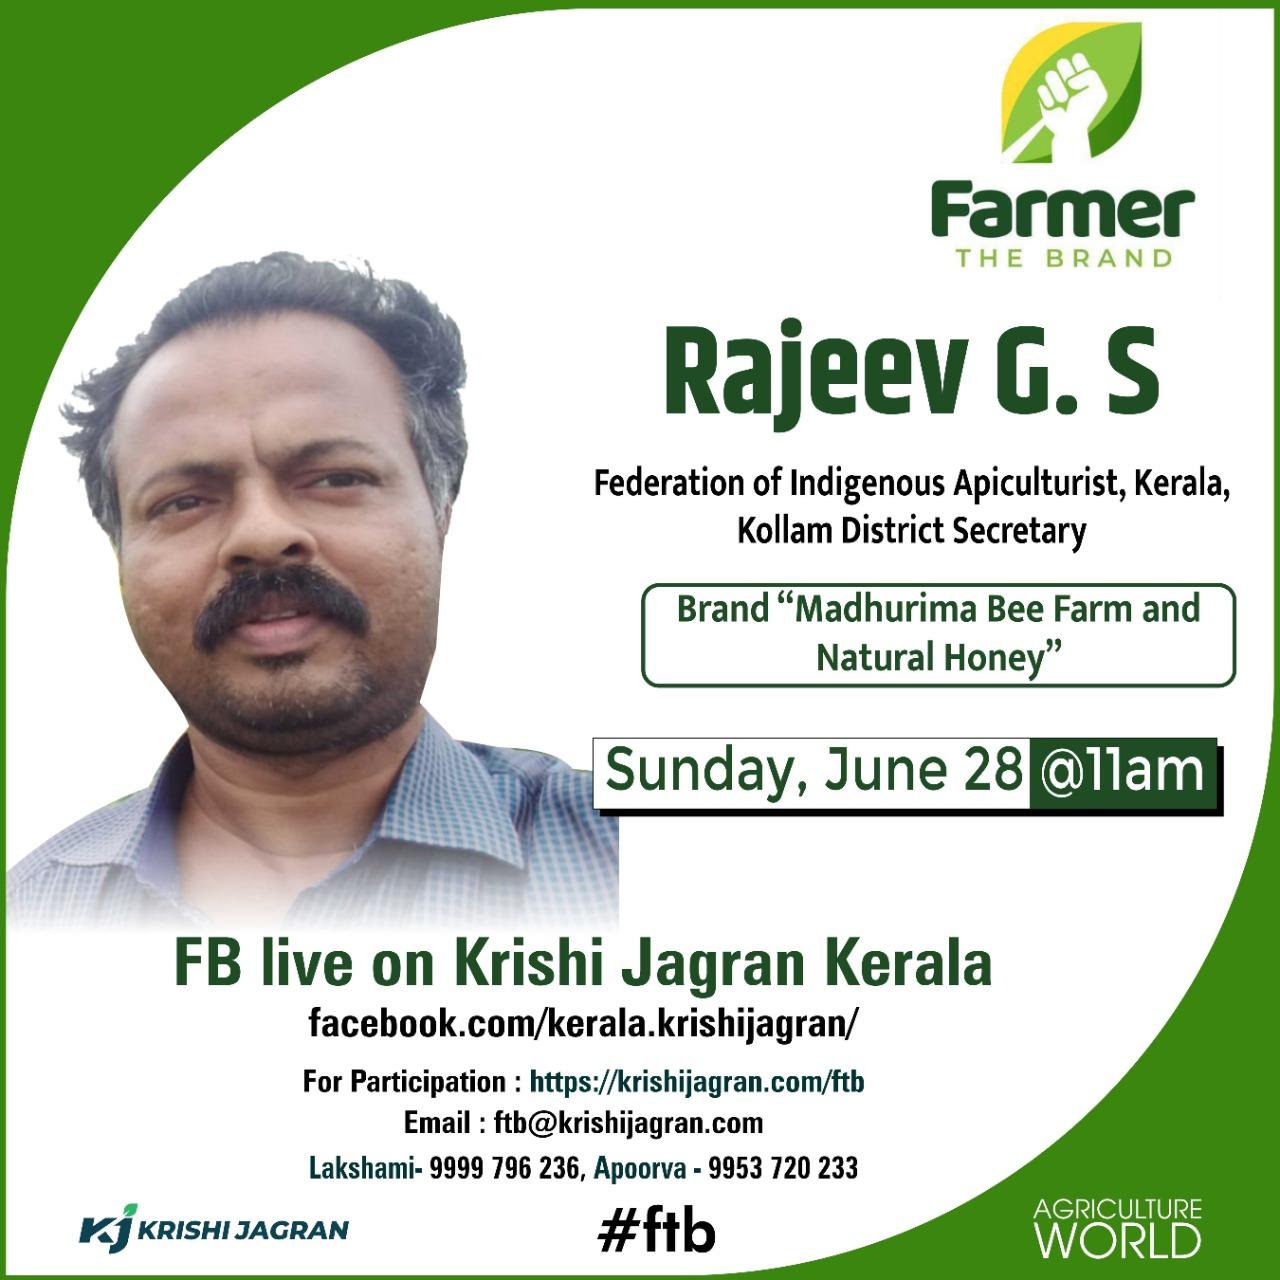 Krishi Jagran facebook Kerala page